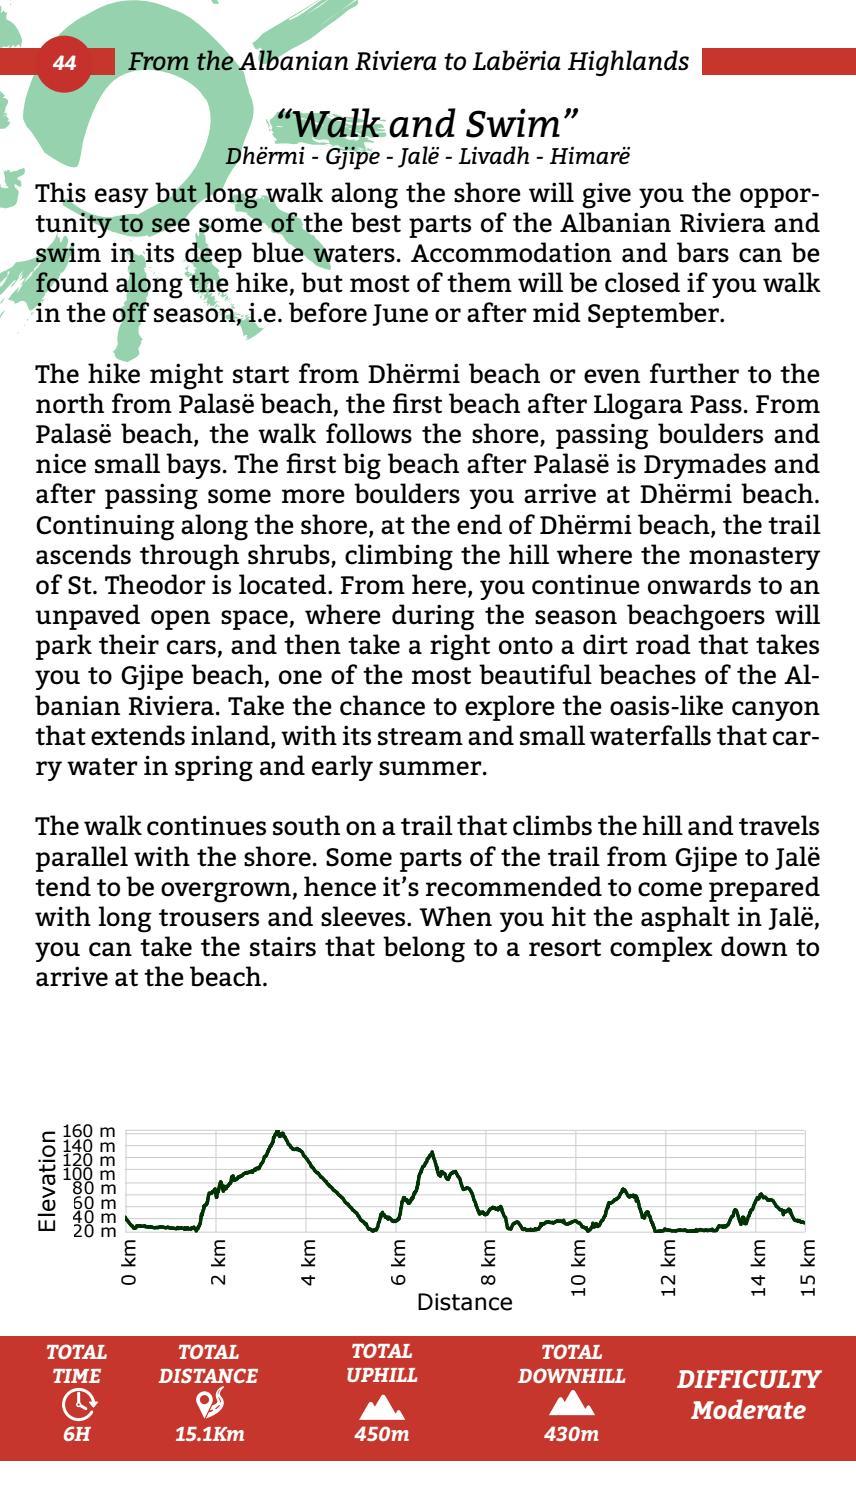 Hiking Trails in Himara Region page 44